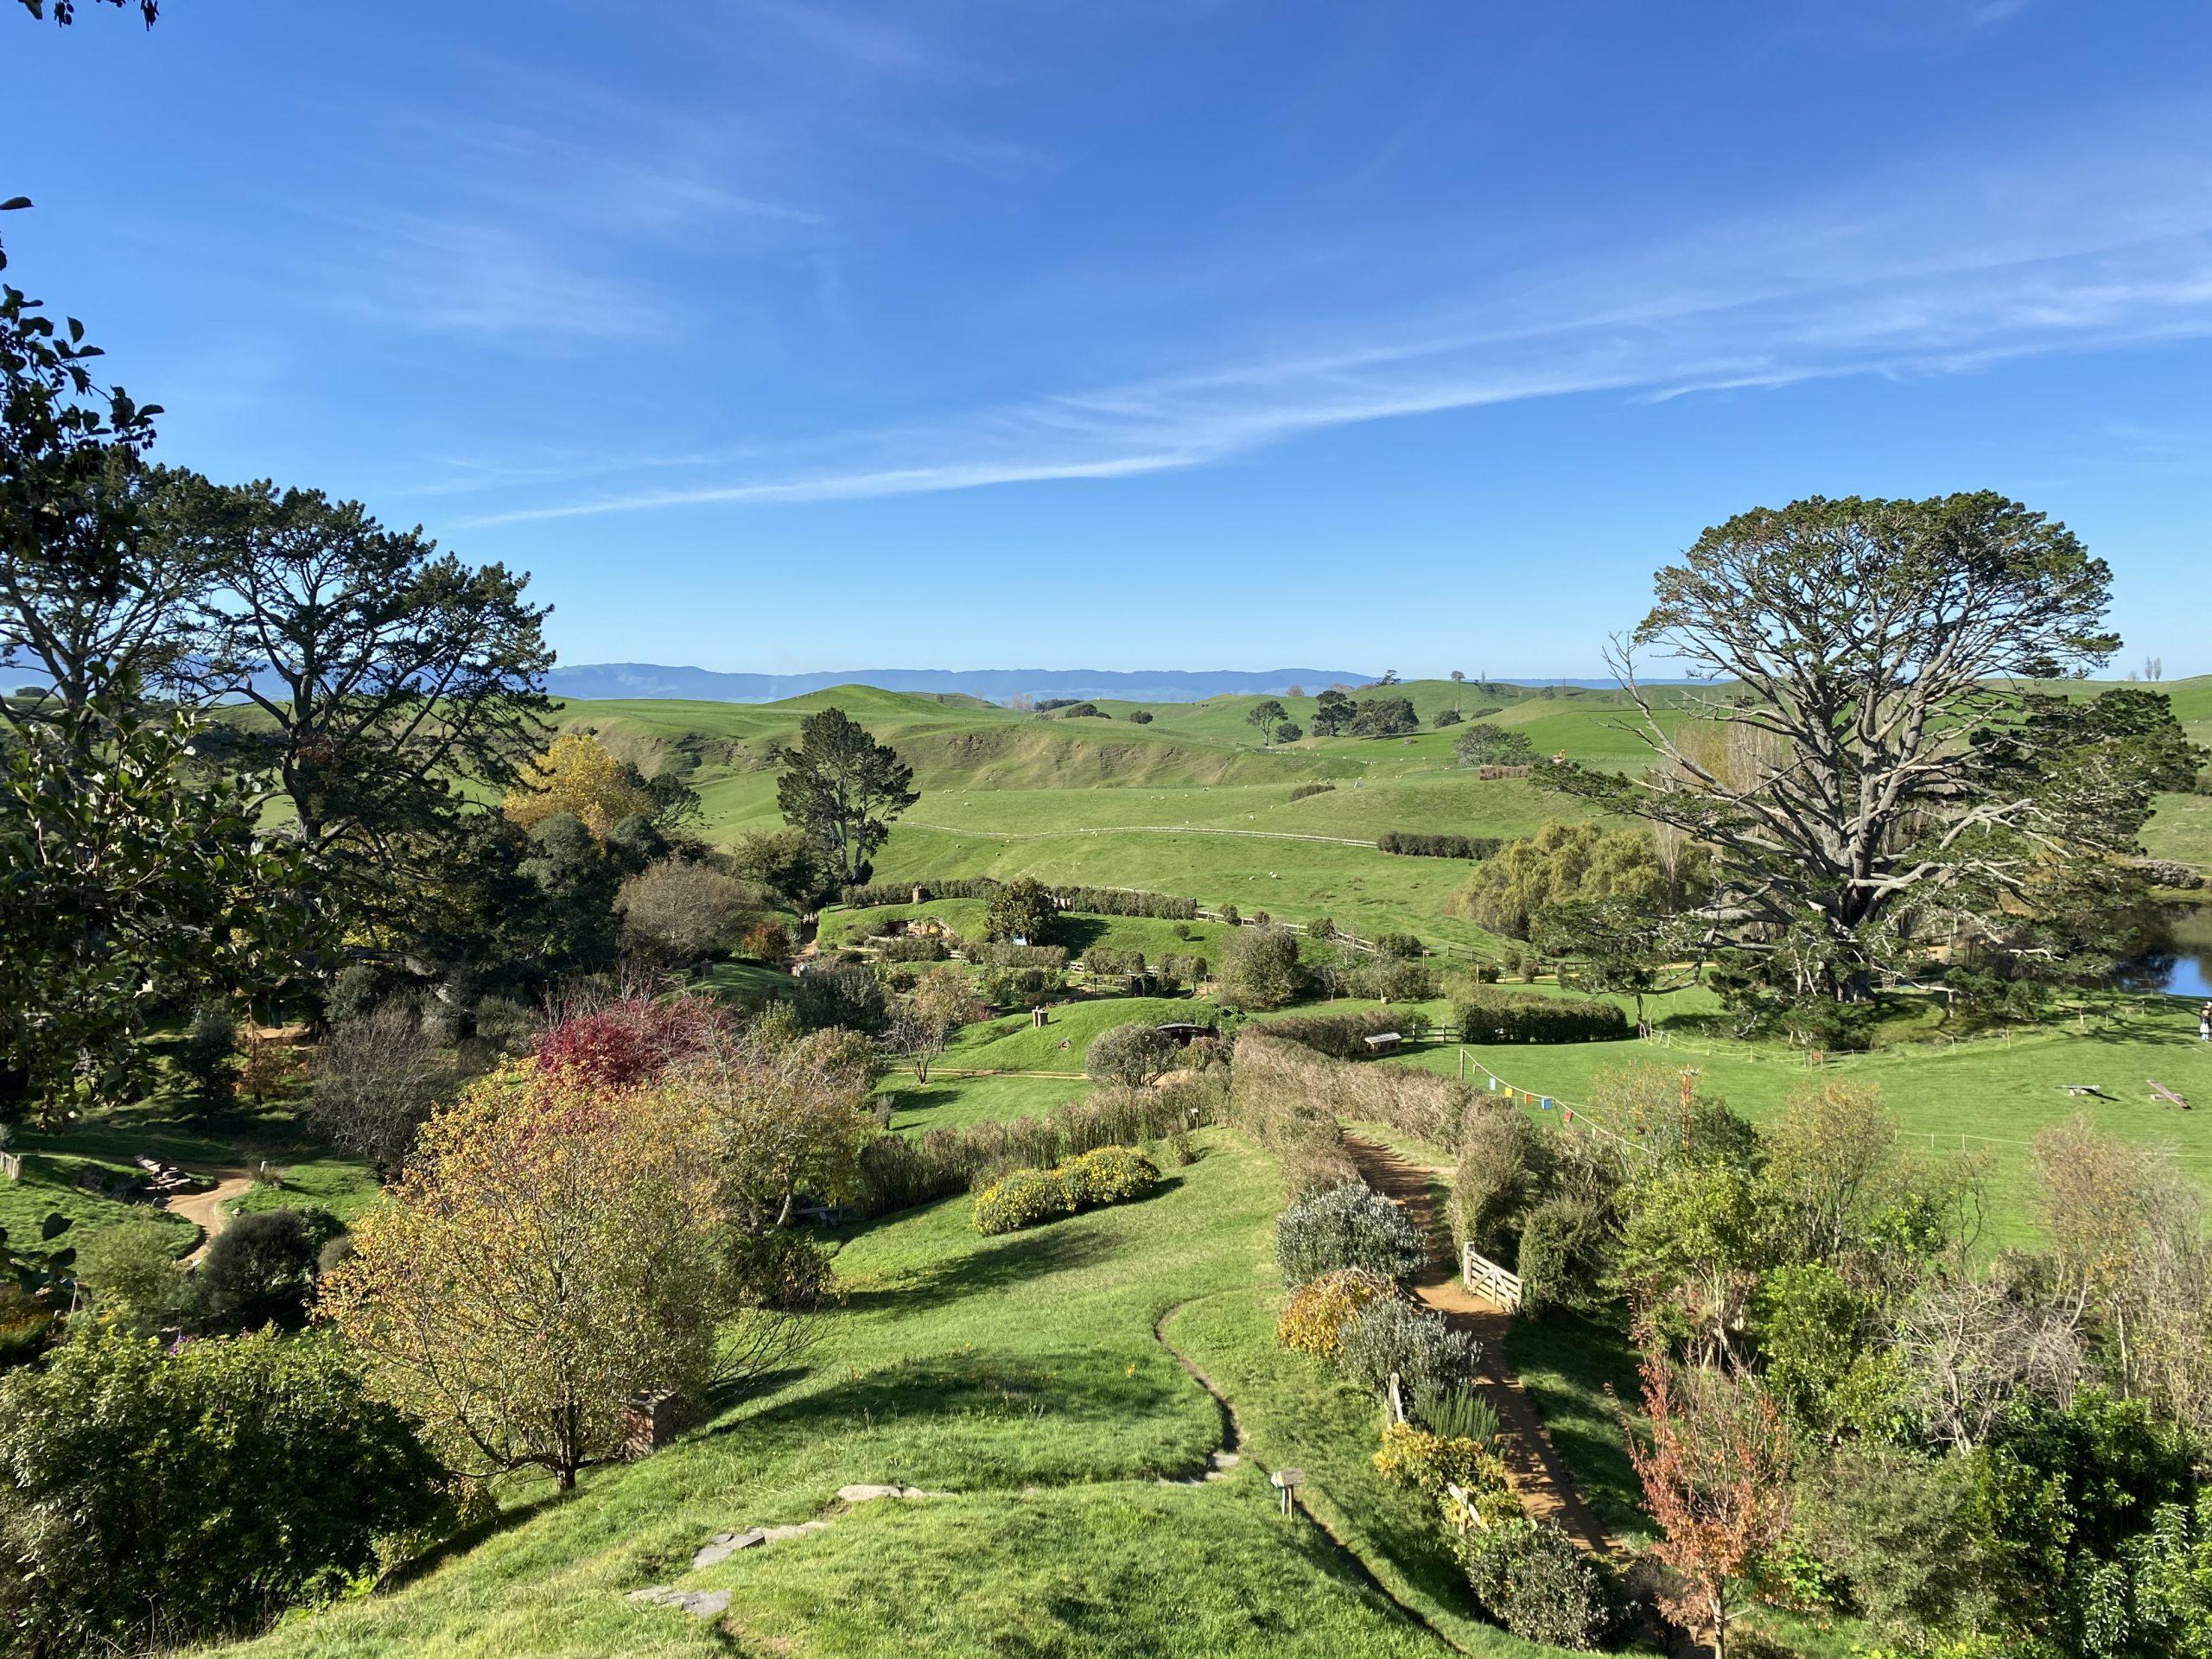 Hobbiton is found on Alexander Farm in Matamata, New Zealand.